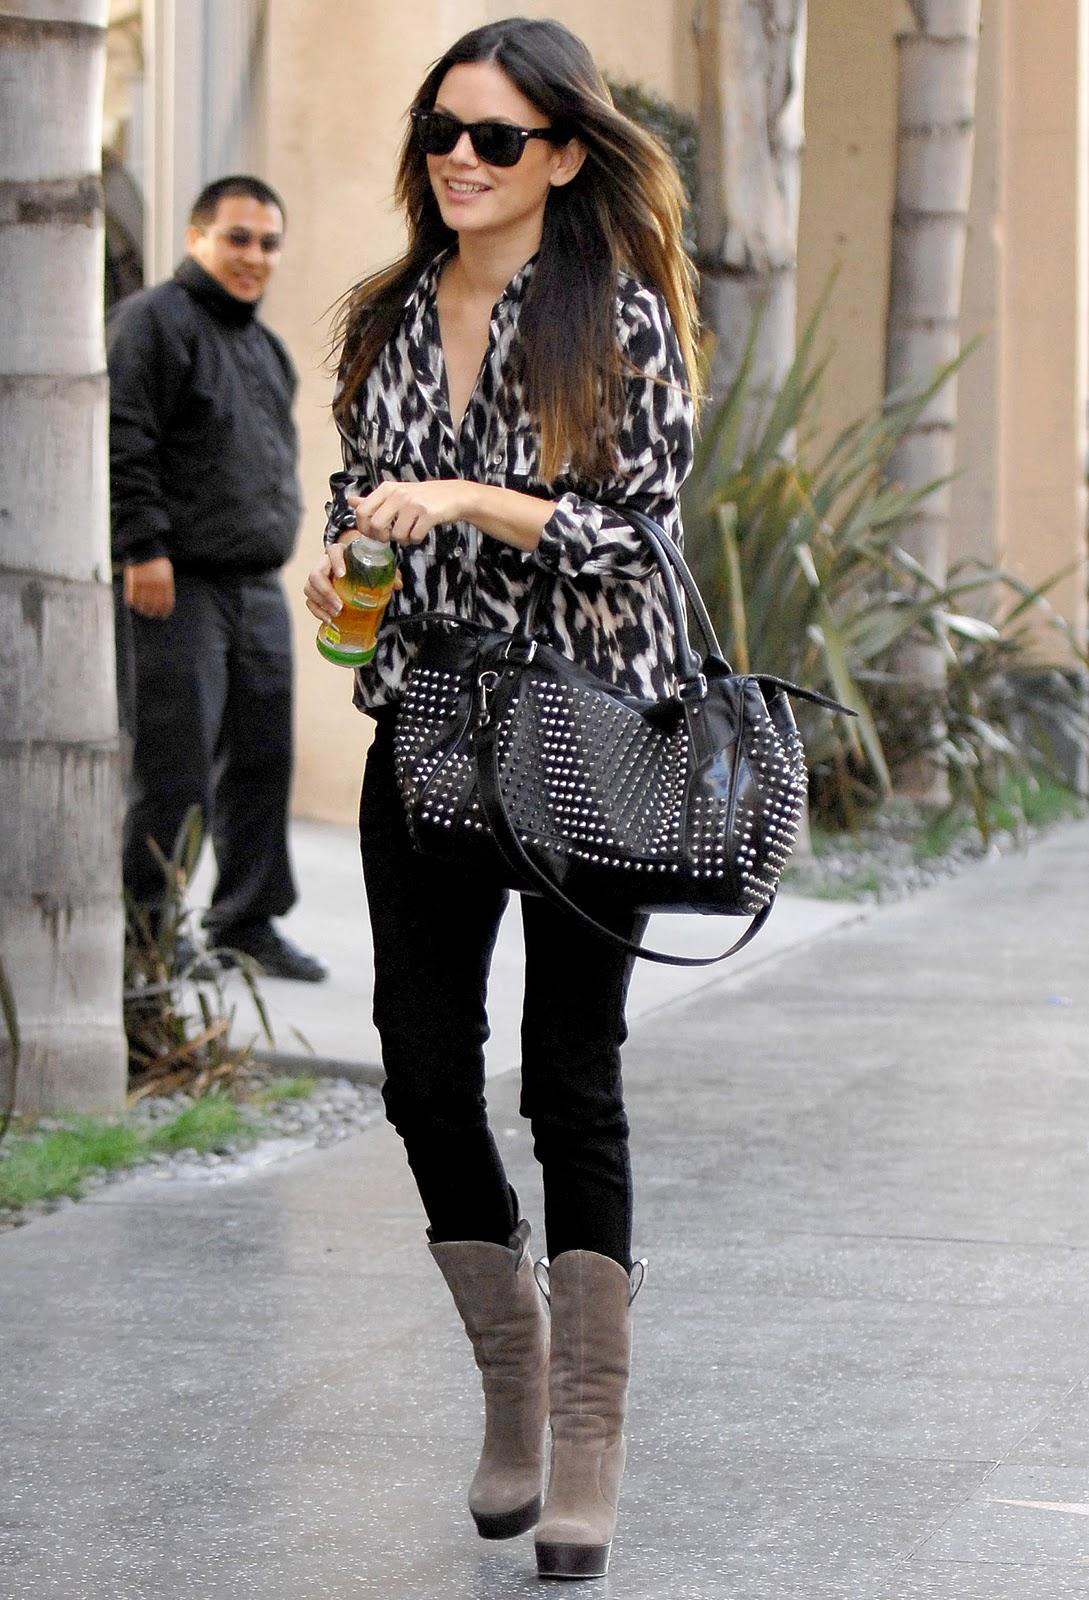 http://3.bp.blogspot.com/-TiFanVYIuik/TuD-Rau3hVI/AAAAAAAAAvc/WUH2K5ESFKw/s1600/22238_celebrity_paradise.com_Rachel_Bilson_out_in_West_Hollywood_17.02.2011_02_122_934lo.jpg